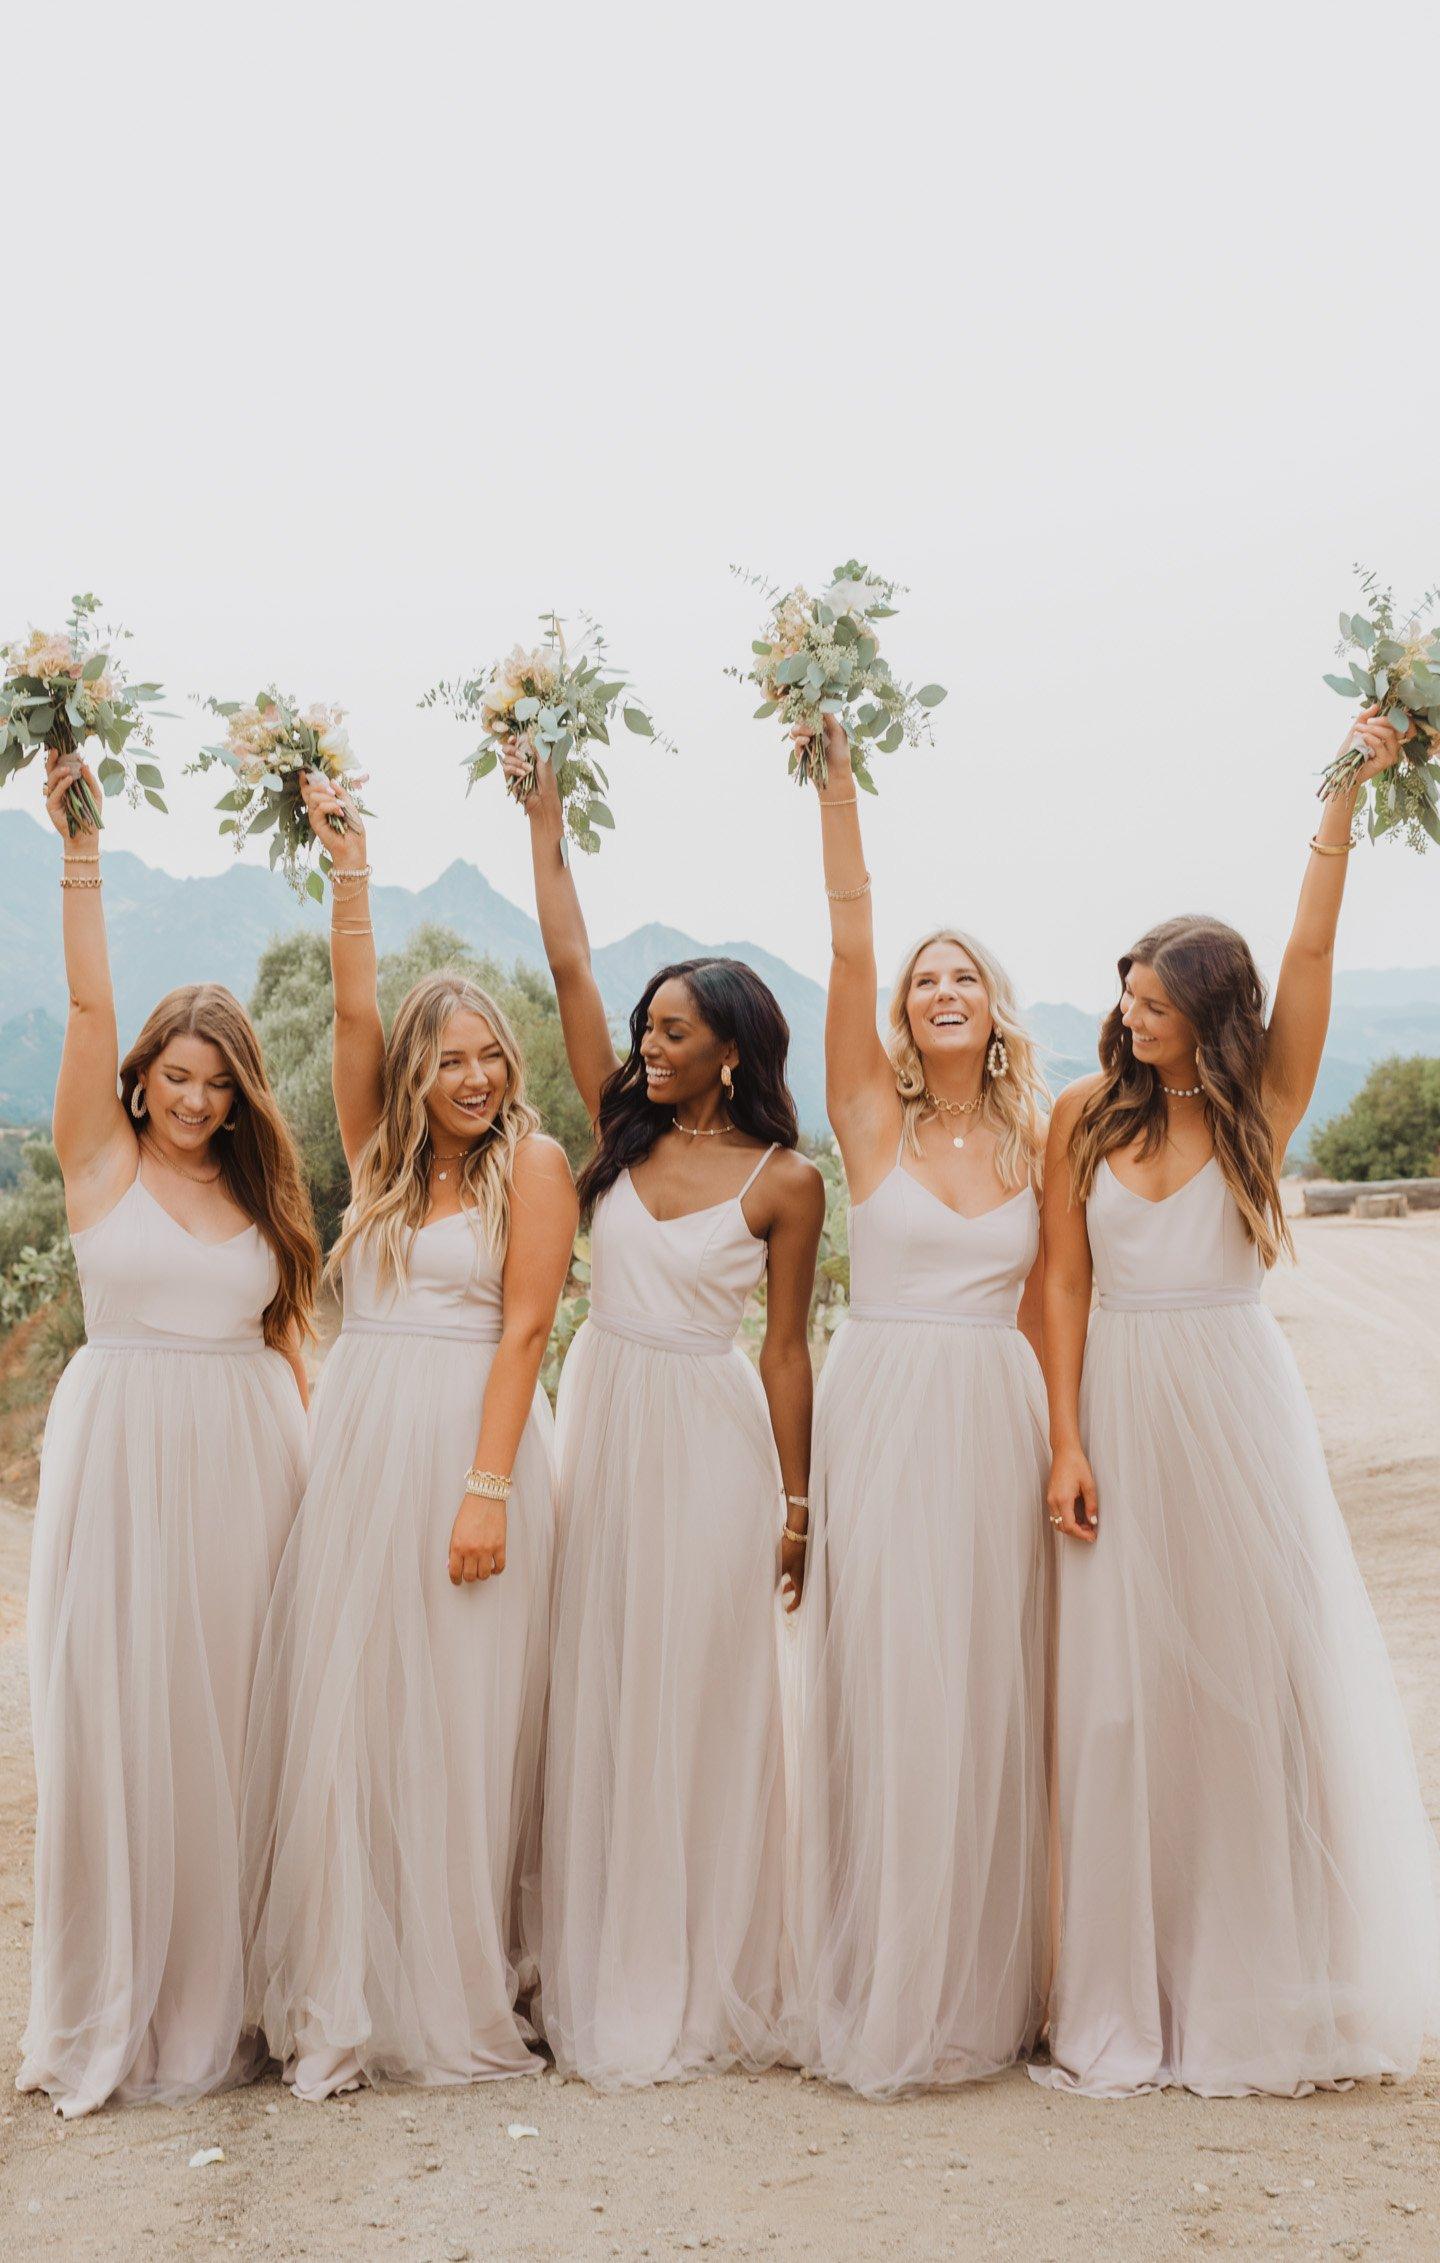 bridesmaid dresses, bridesmaid dress ideas, bridesmaid dress colors, bridesmaid dress styles, affordable bridesmaid dress, neutral bridesmaid dress, maxi bridesmaid dress